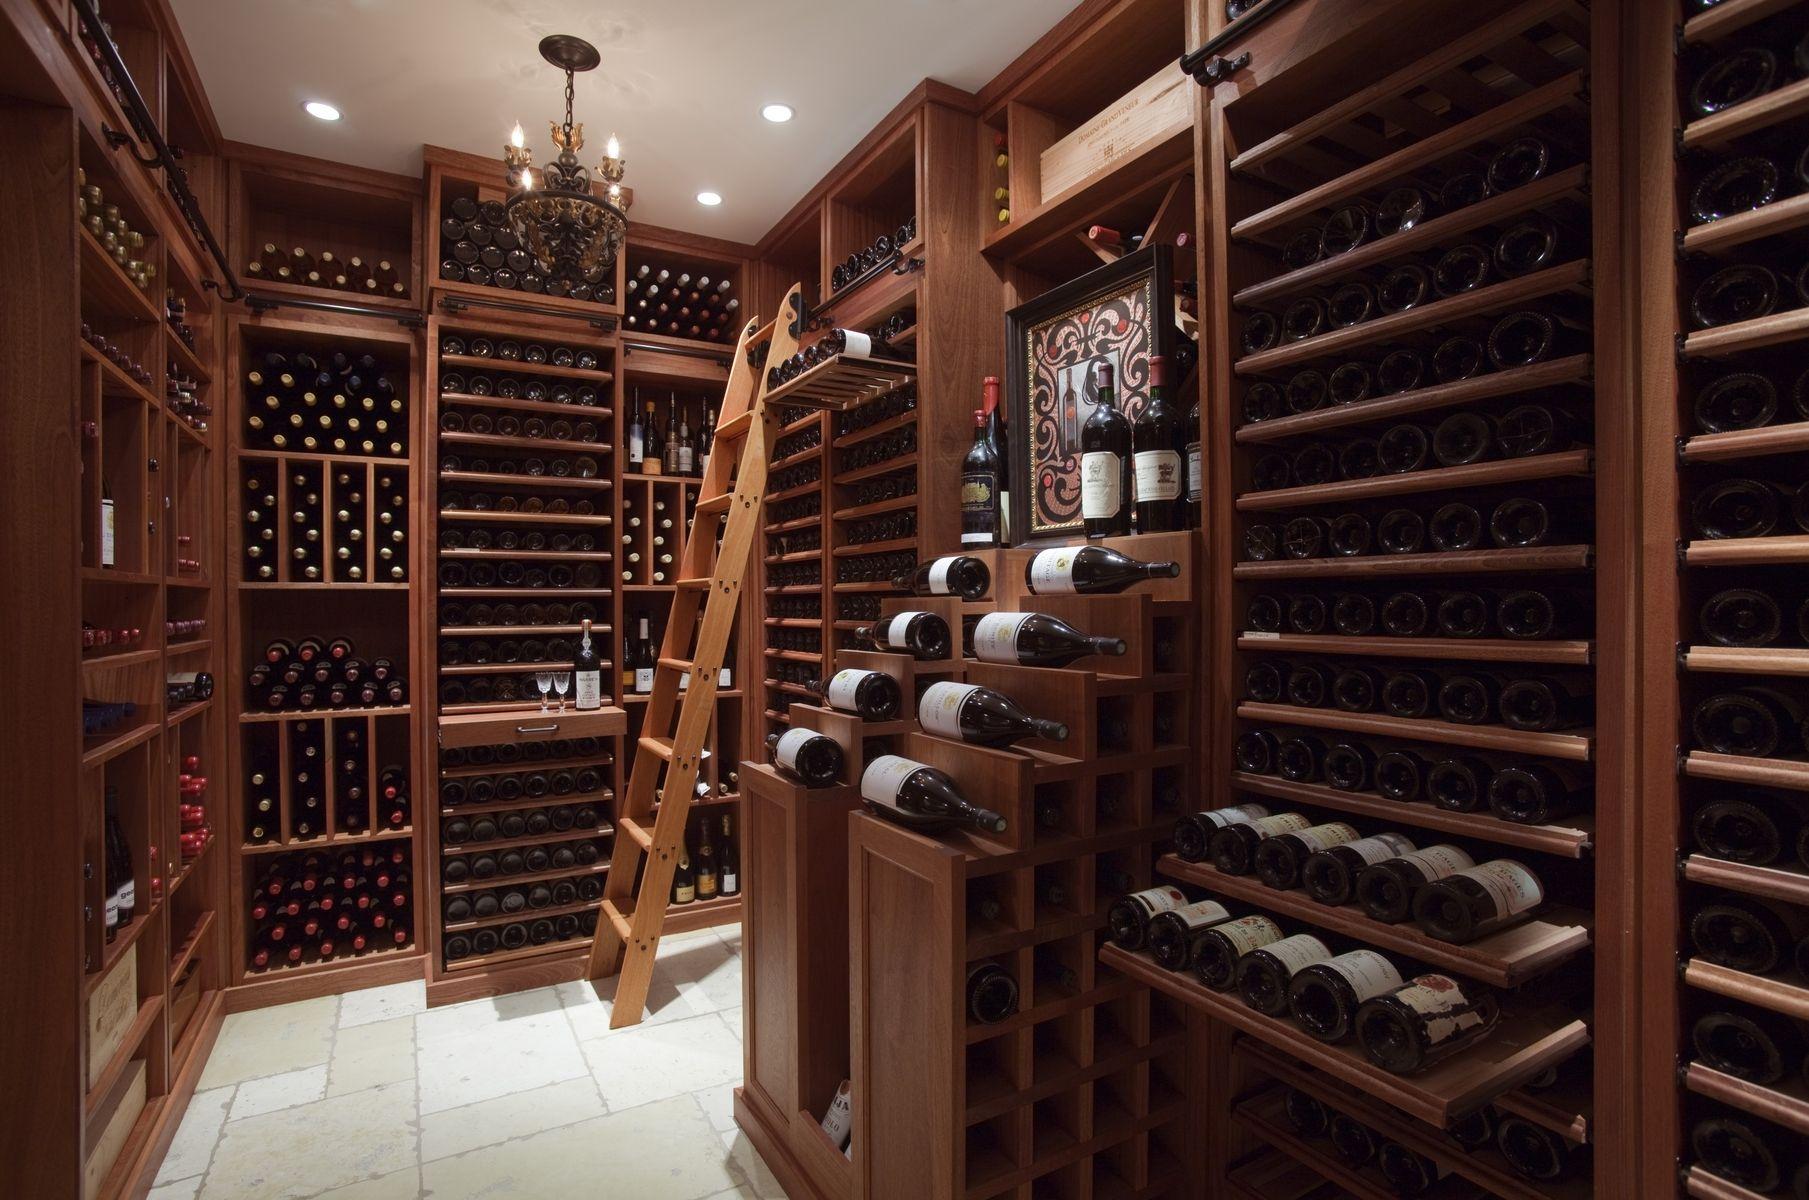 Hand Made Wine Cellar By Superior Woodcraft Inc CustomMadecom - Wine cellar decorating ideas